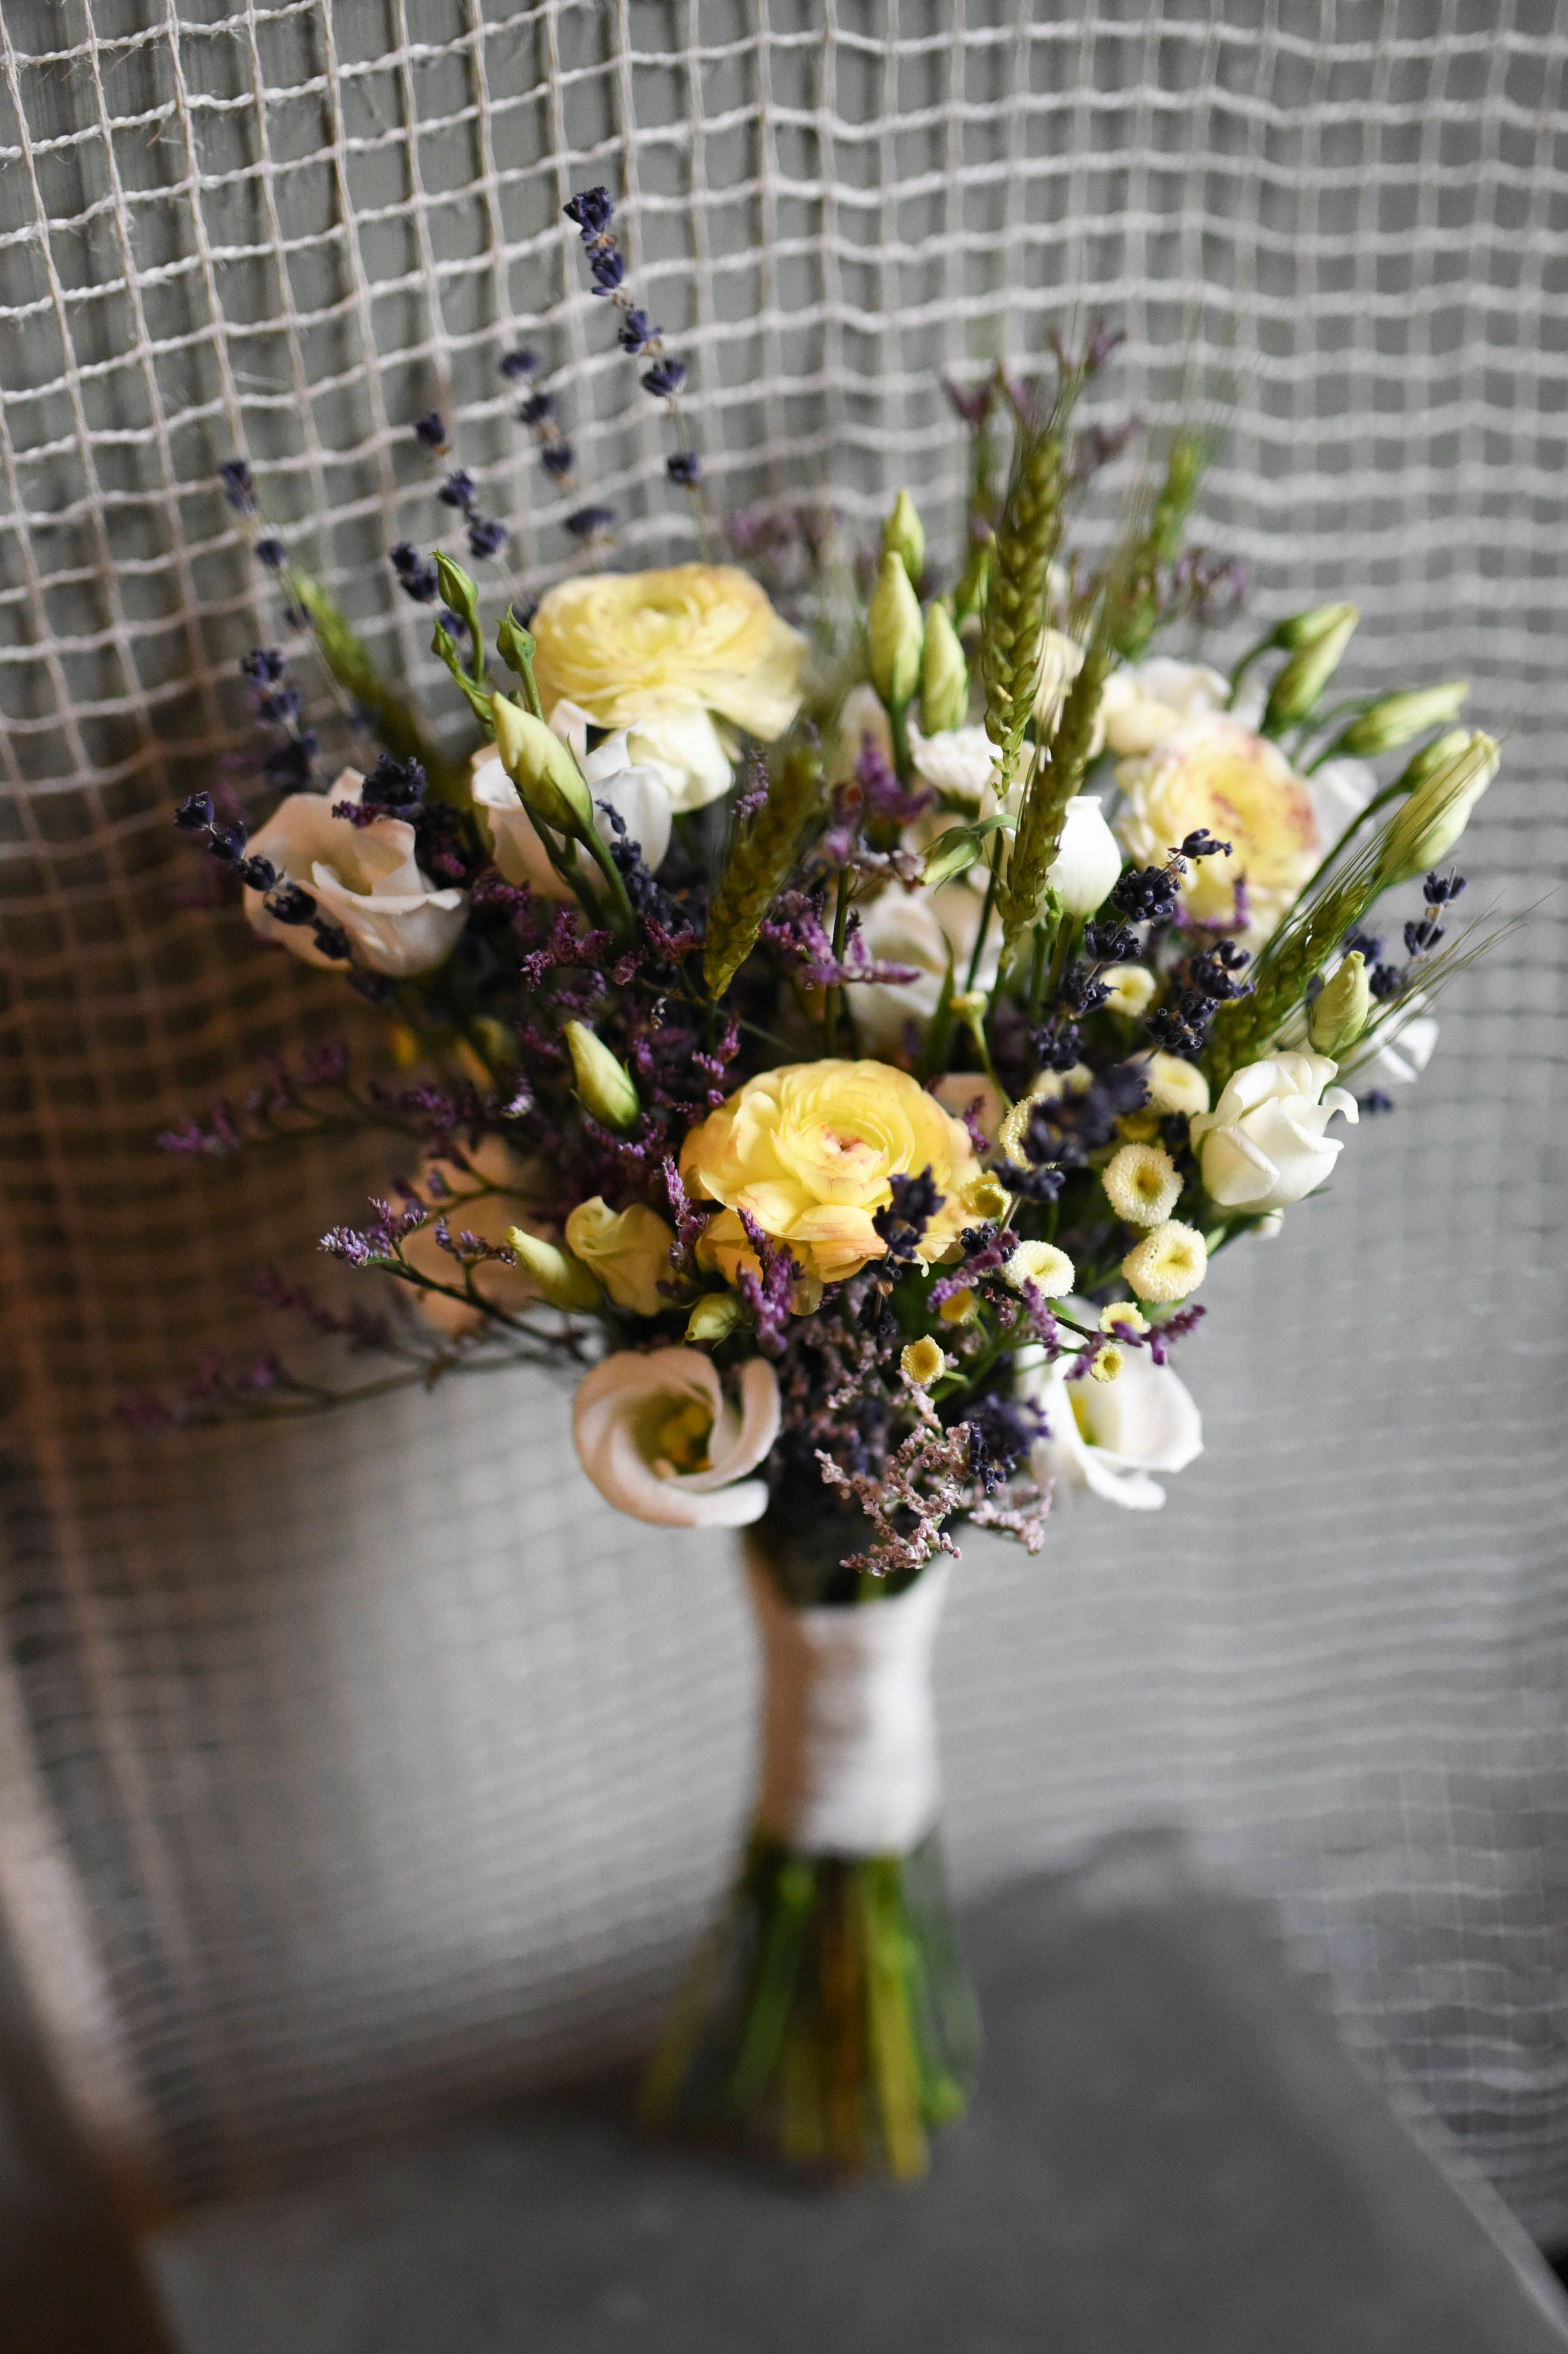 Seaside Wildflower Wedding Bouquet Featuring Wheat Statice